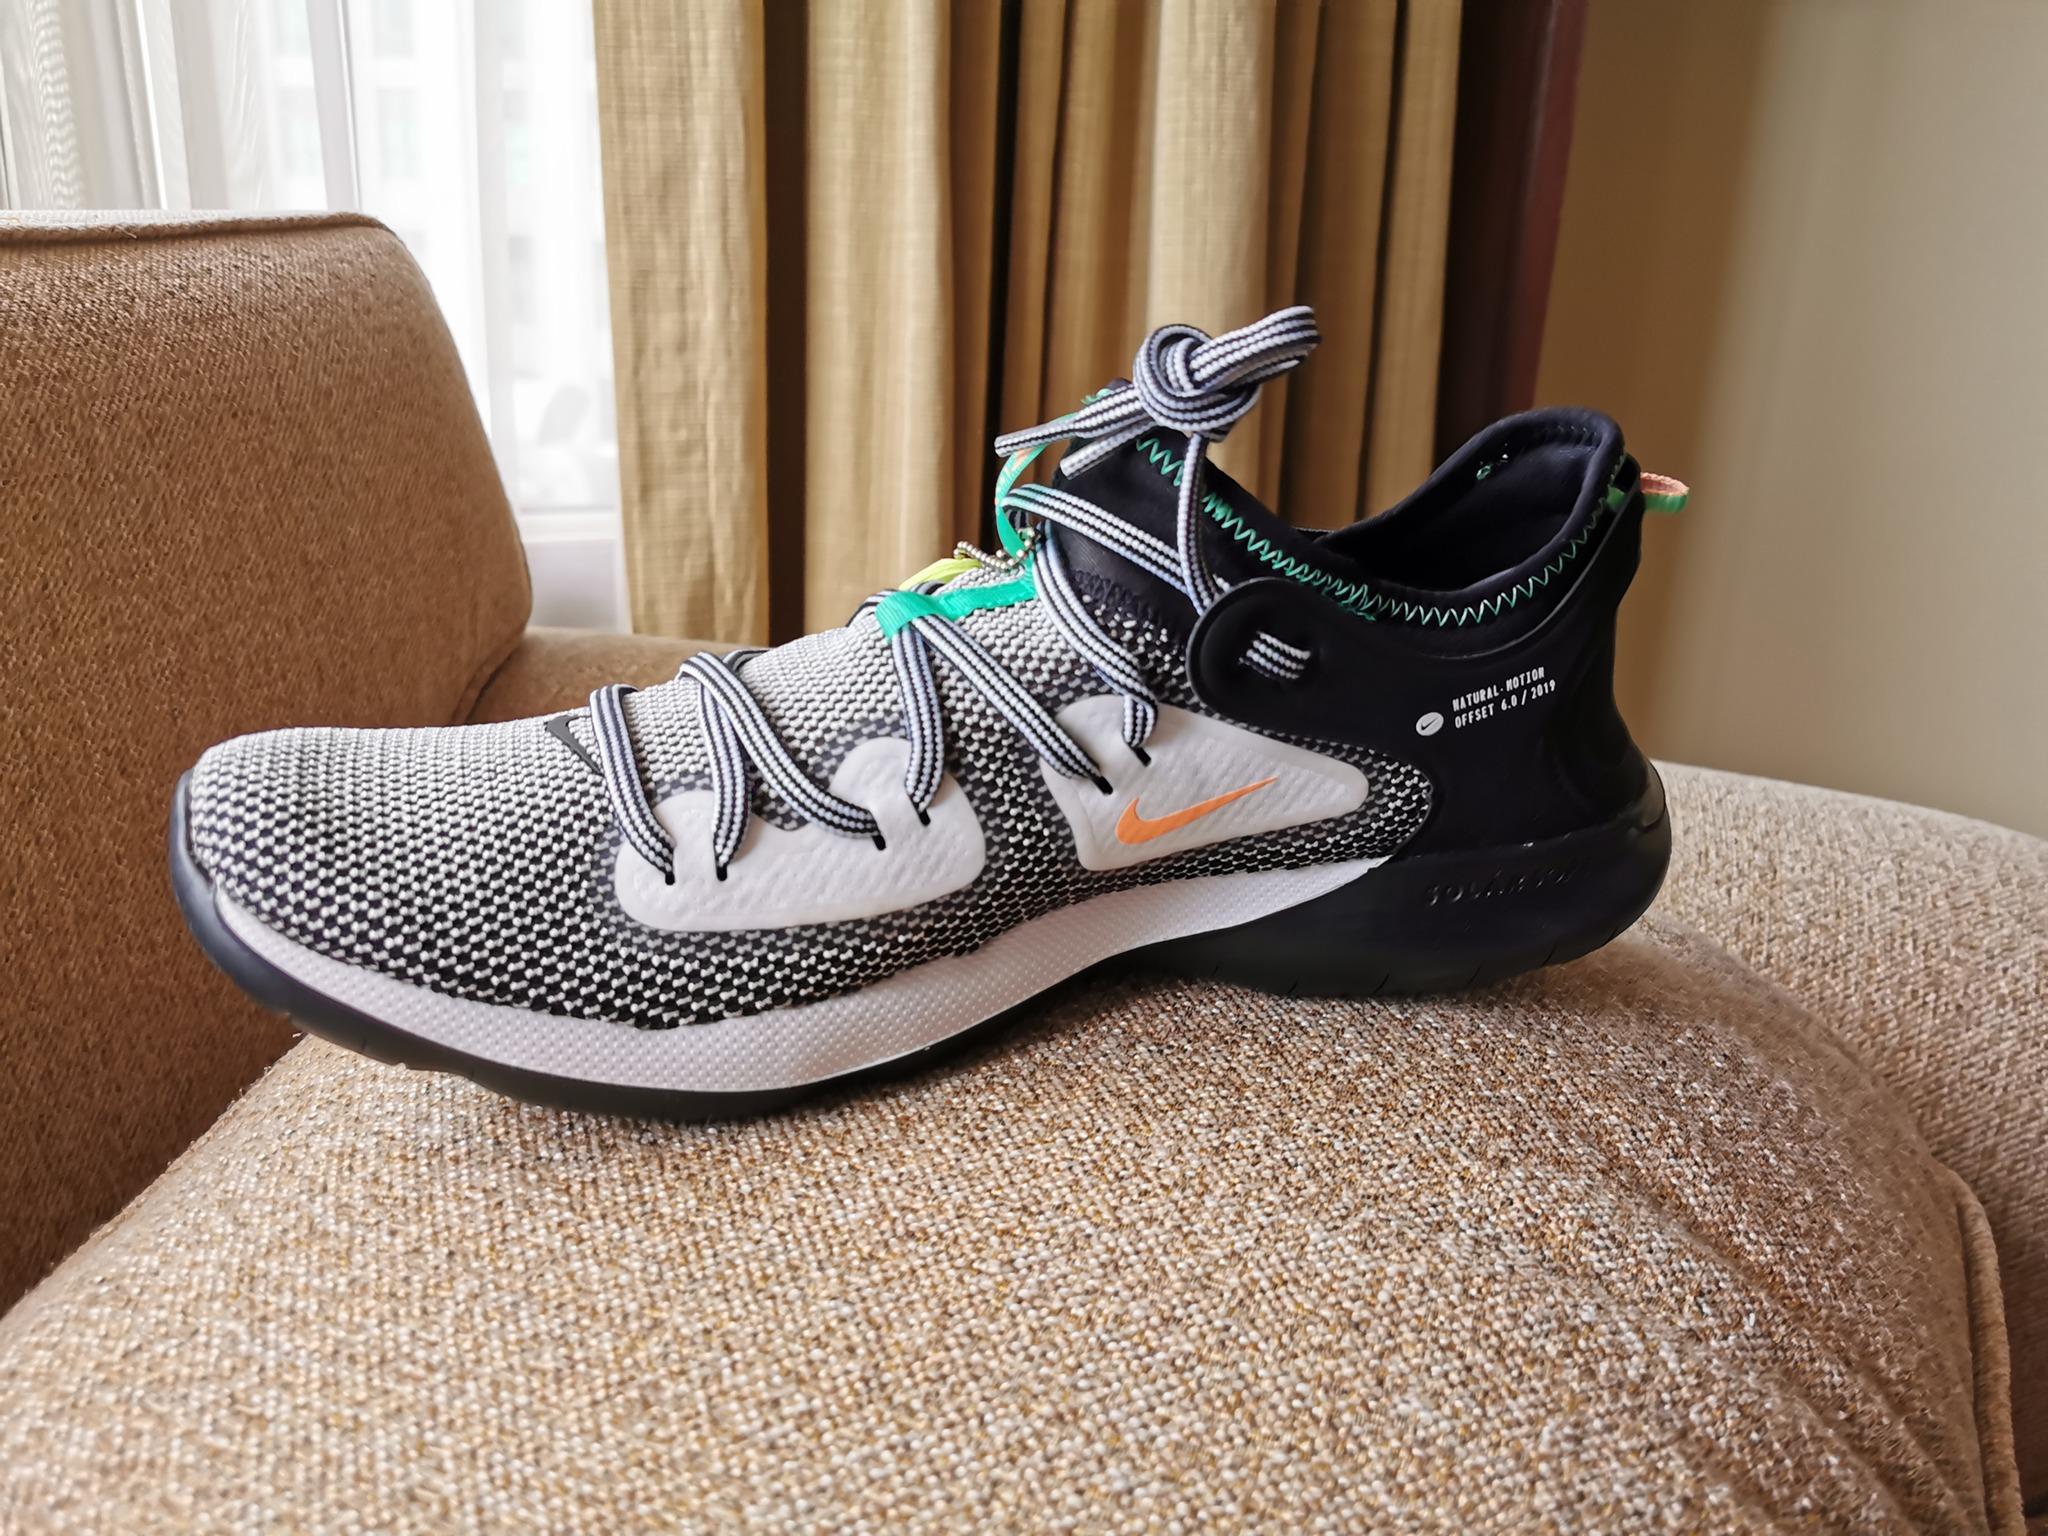 Nike Flex 2019 RN SE: The Stylish Men's